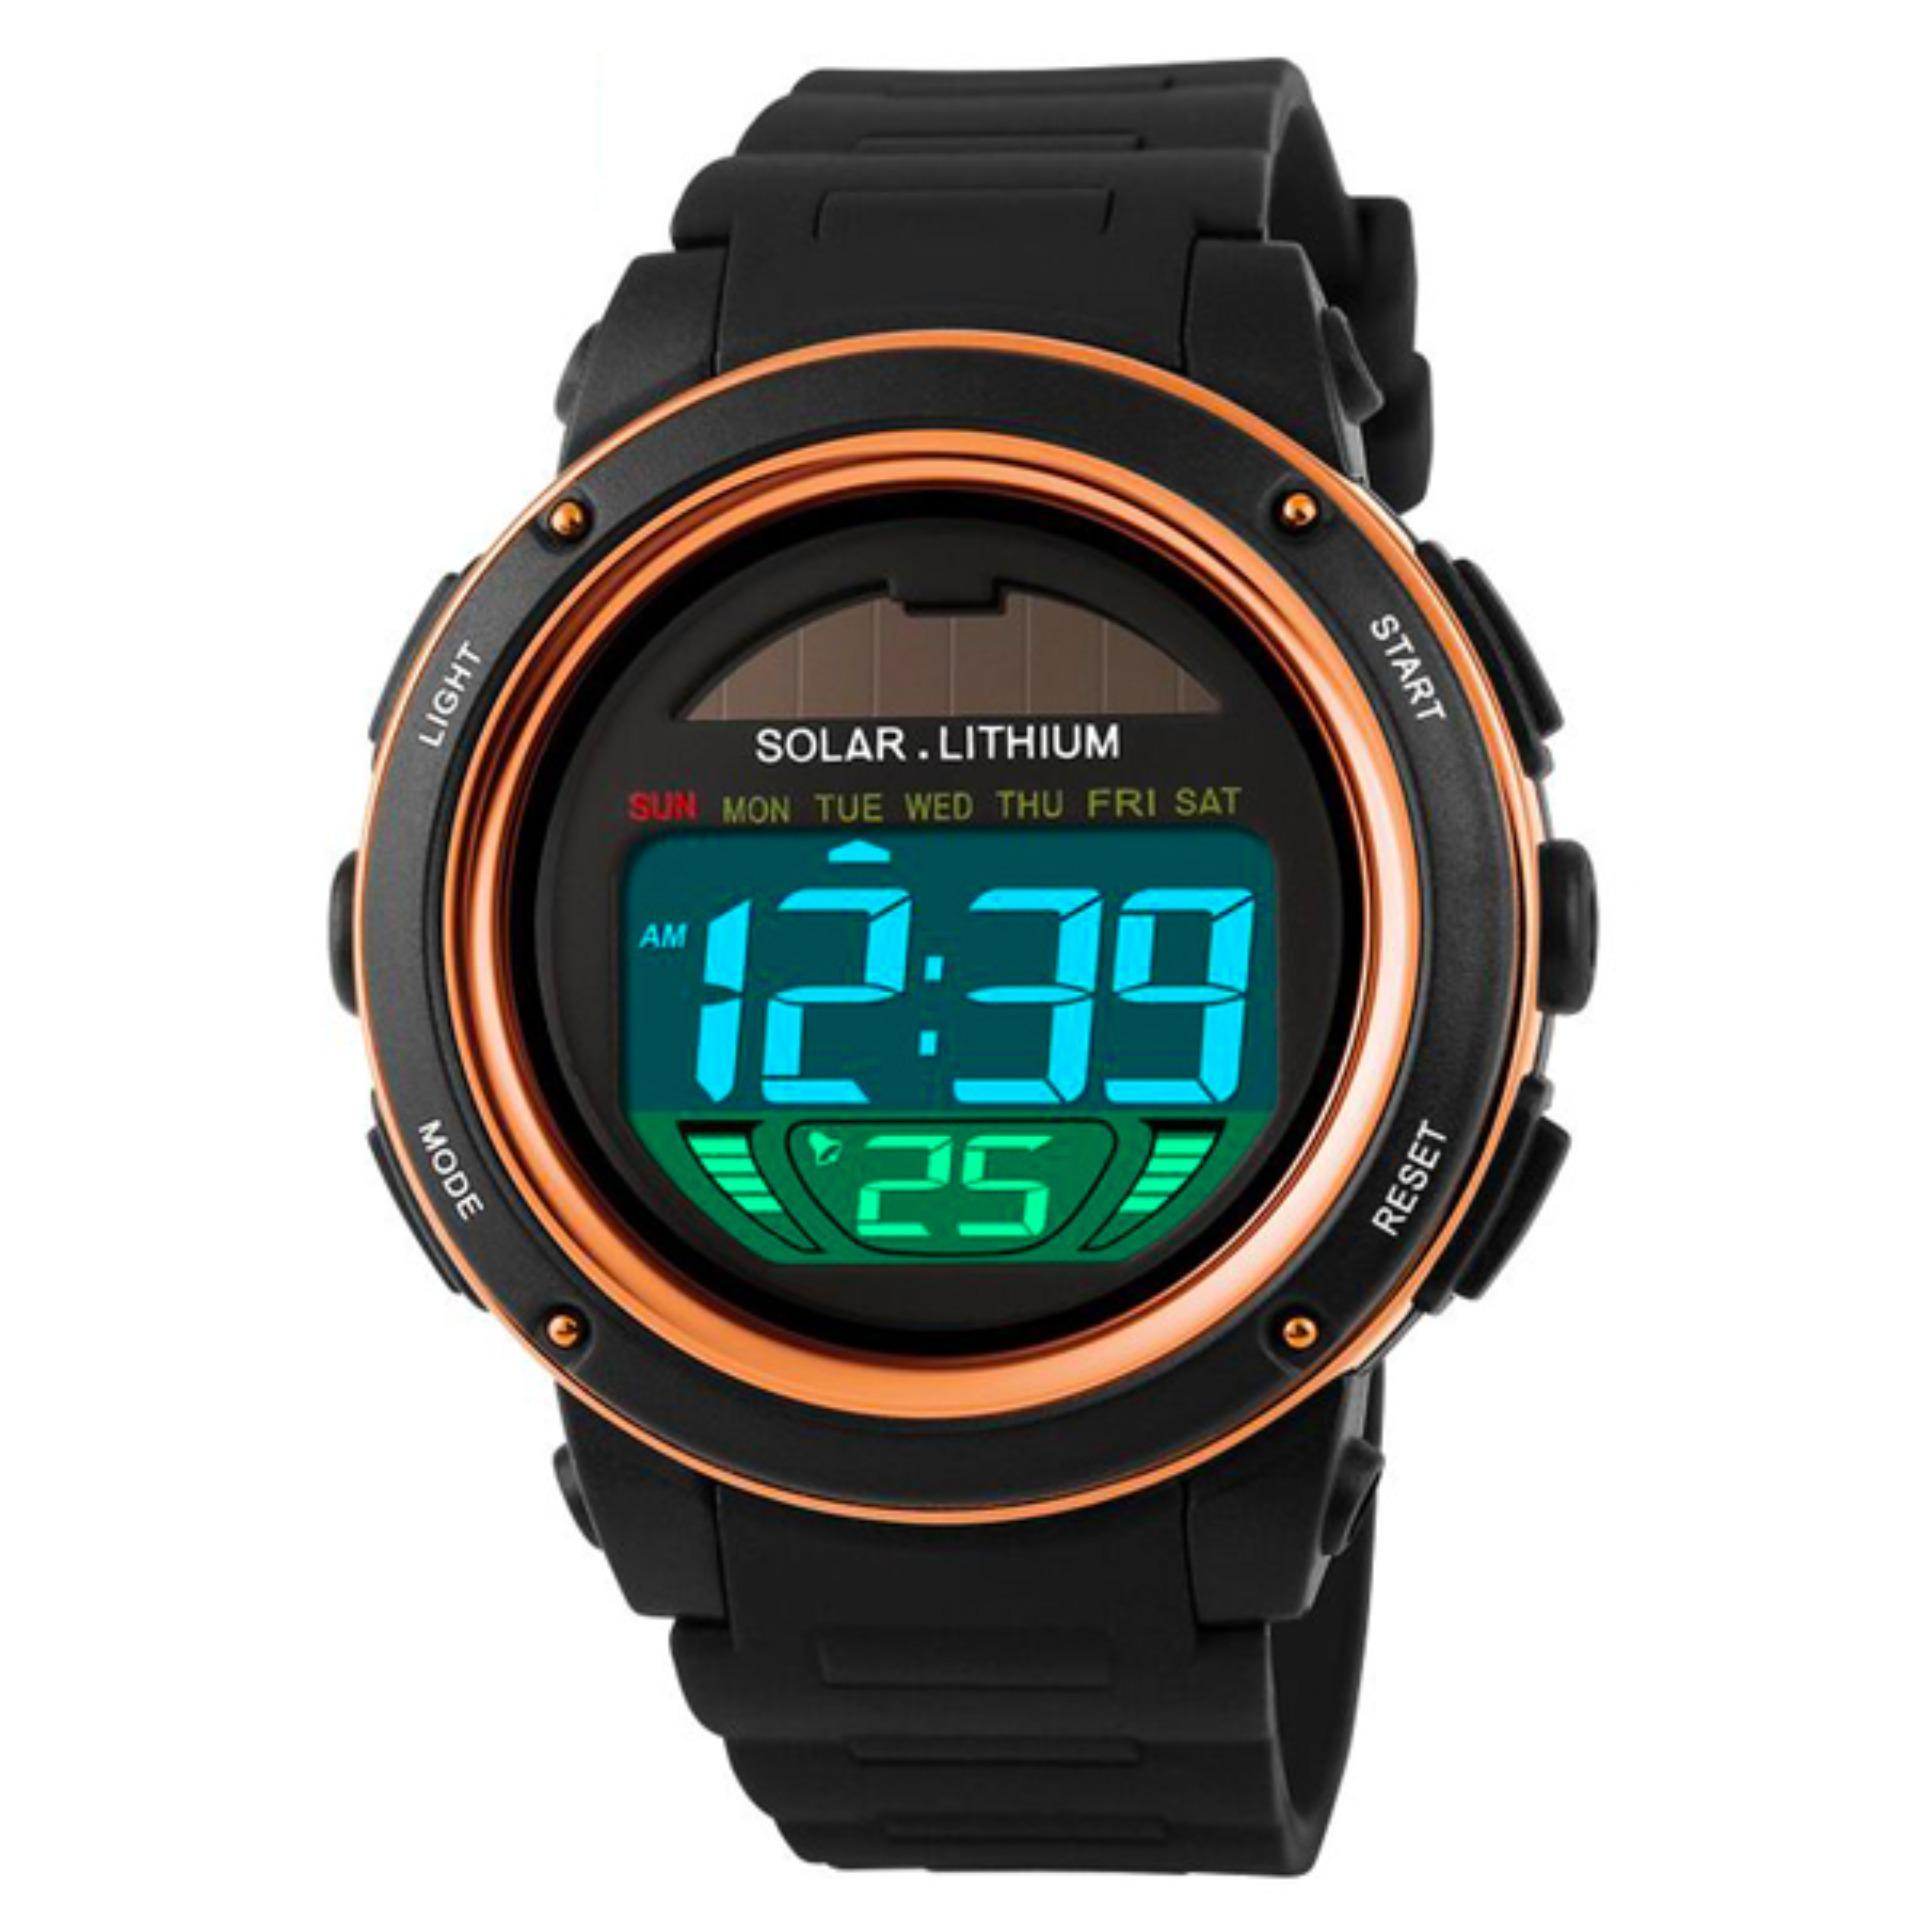 Harga Skmei Solar Power Sport Led Watch Water Resistant 50M Dg1096 Jam Tangan Fashion Kasual Pria Termurah